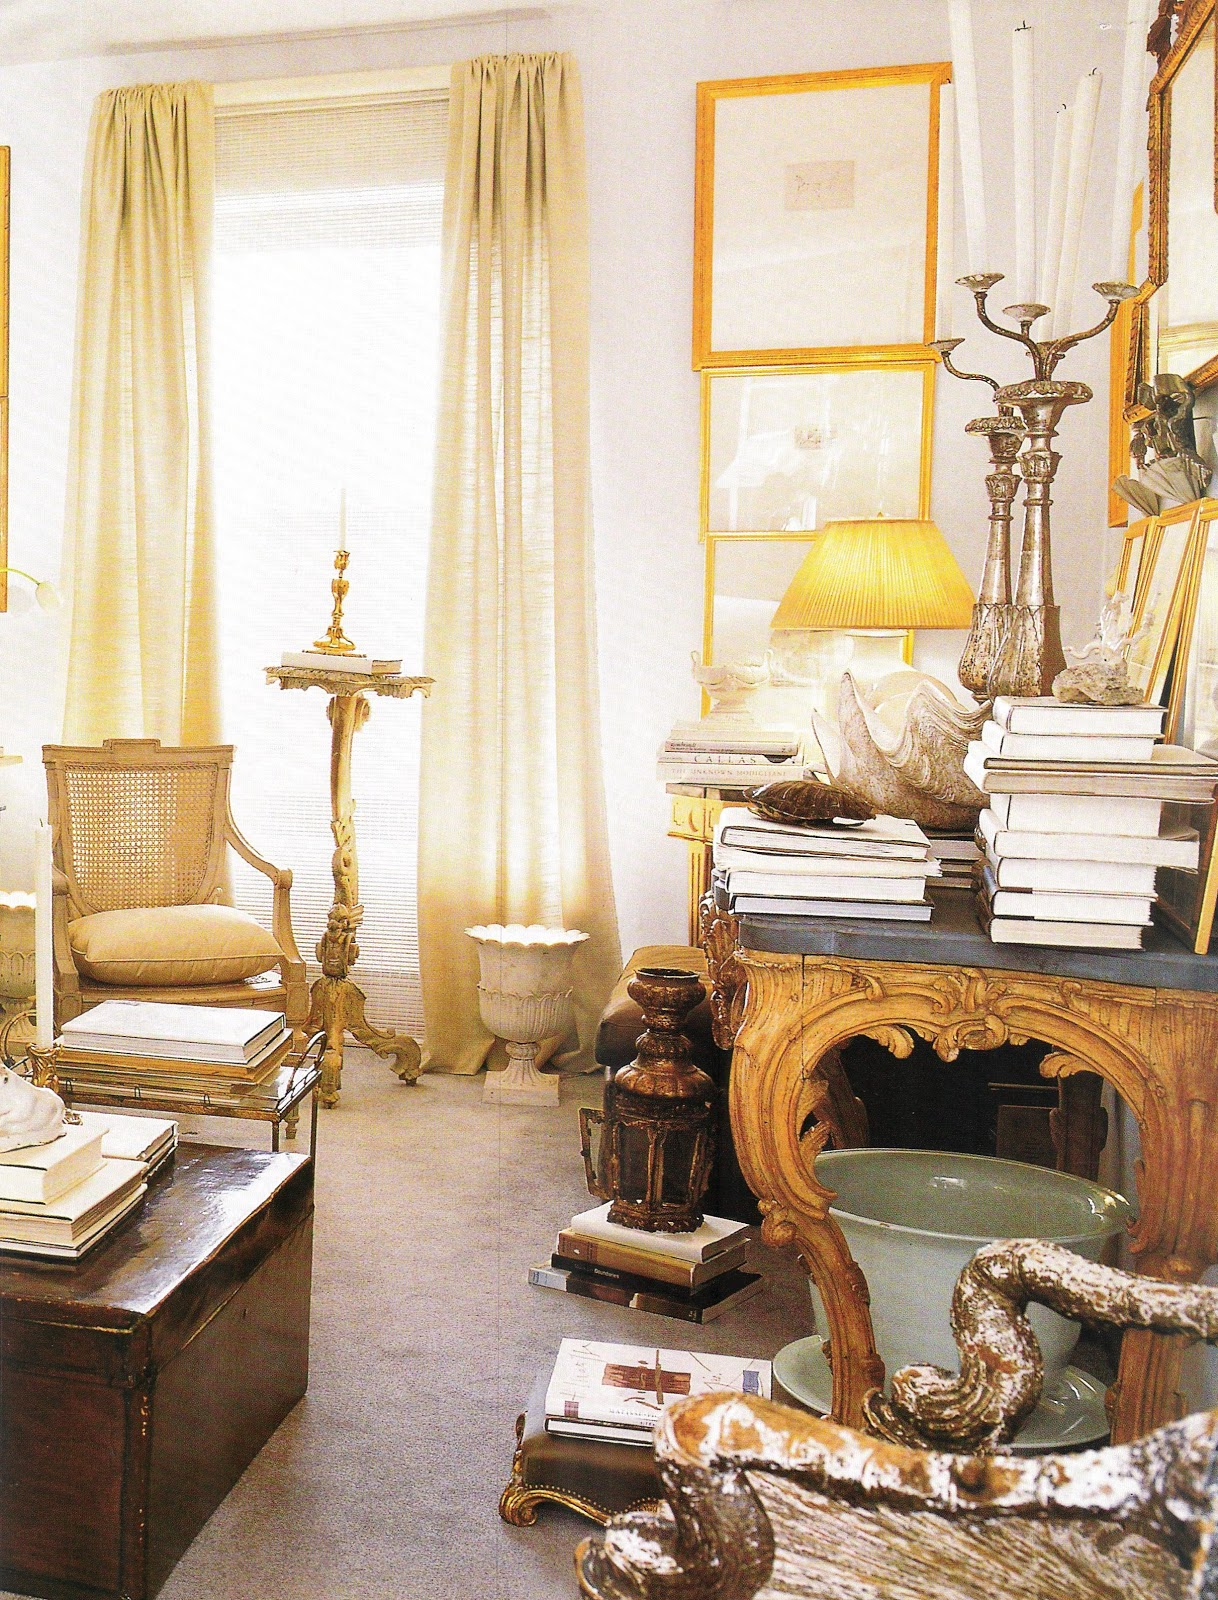 88 interior design blog interior design blogs boston for Home interior design consultants